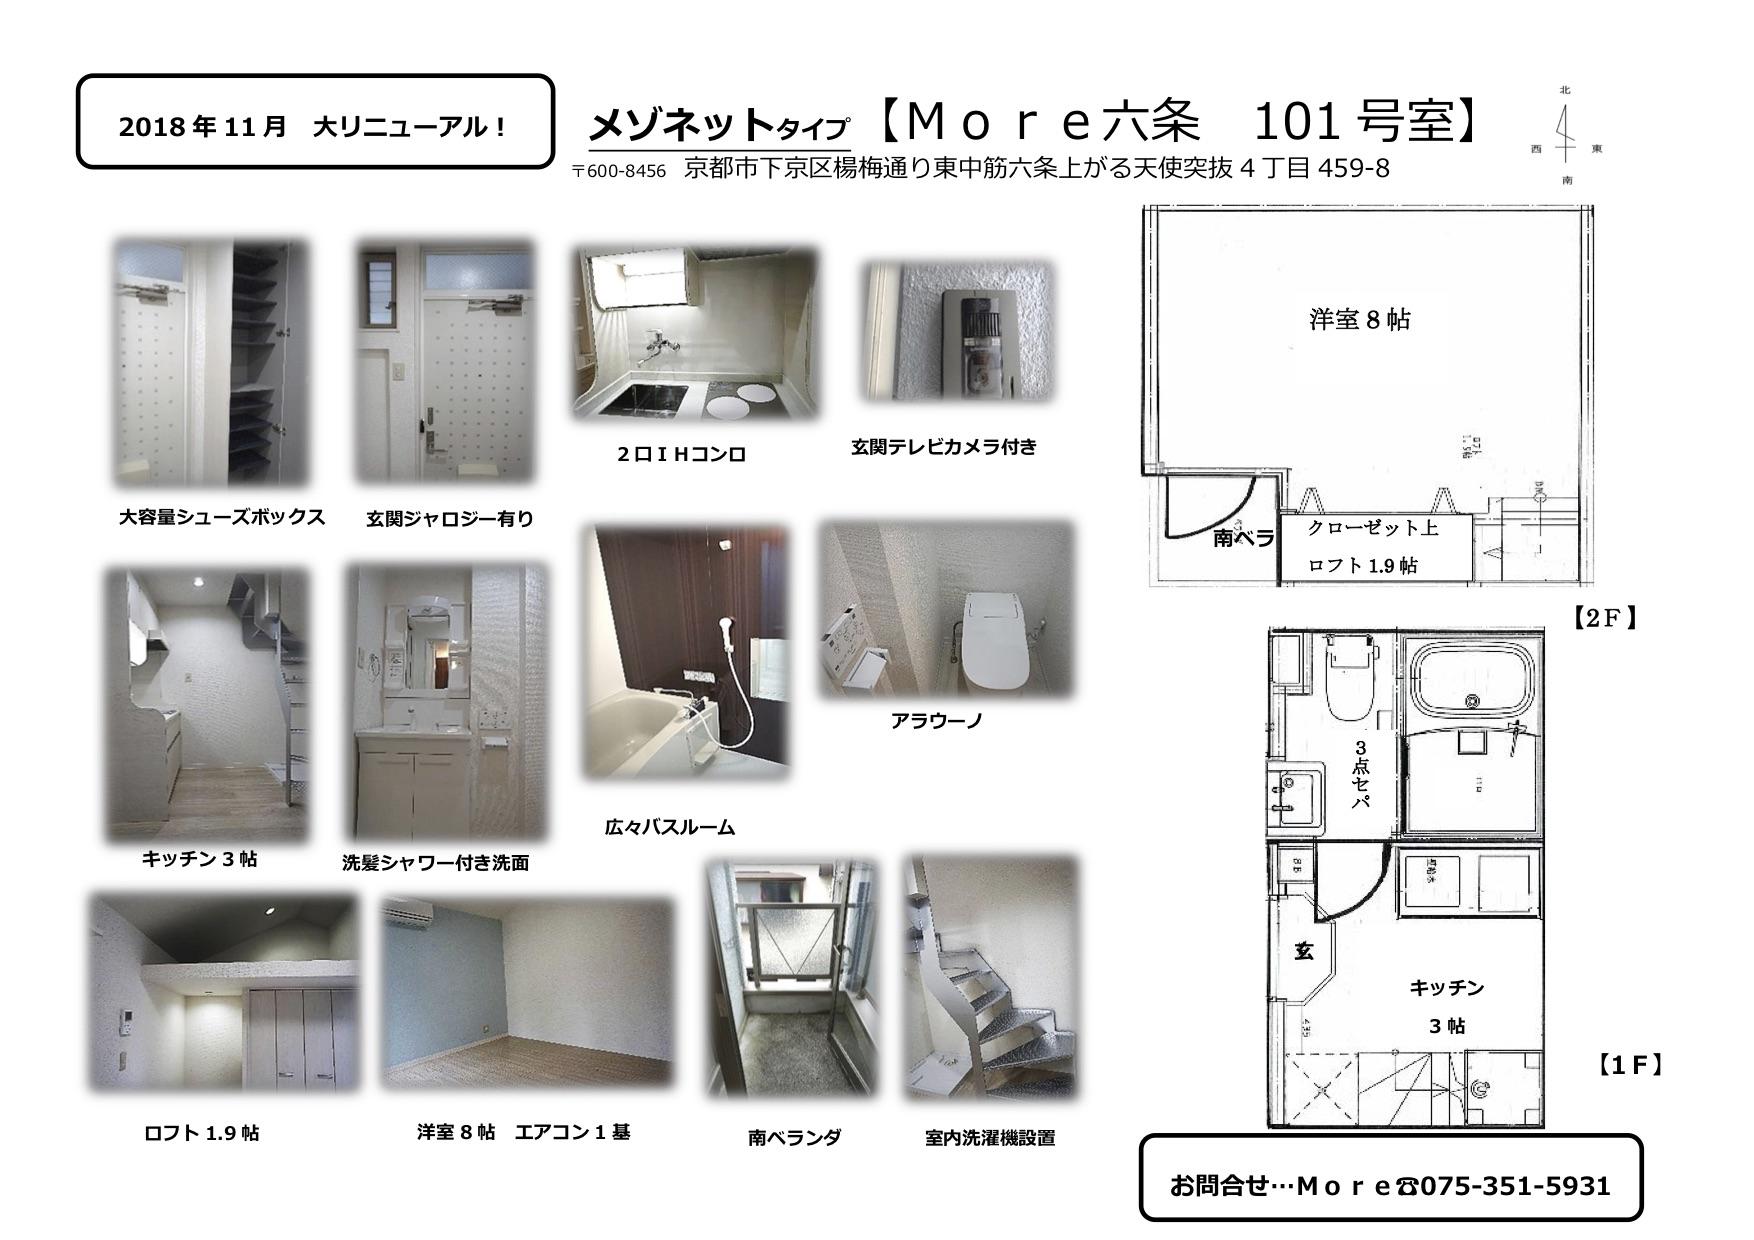 More六条 101号室